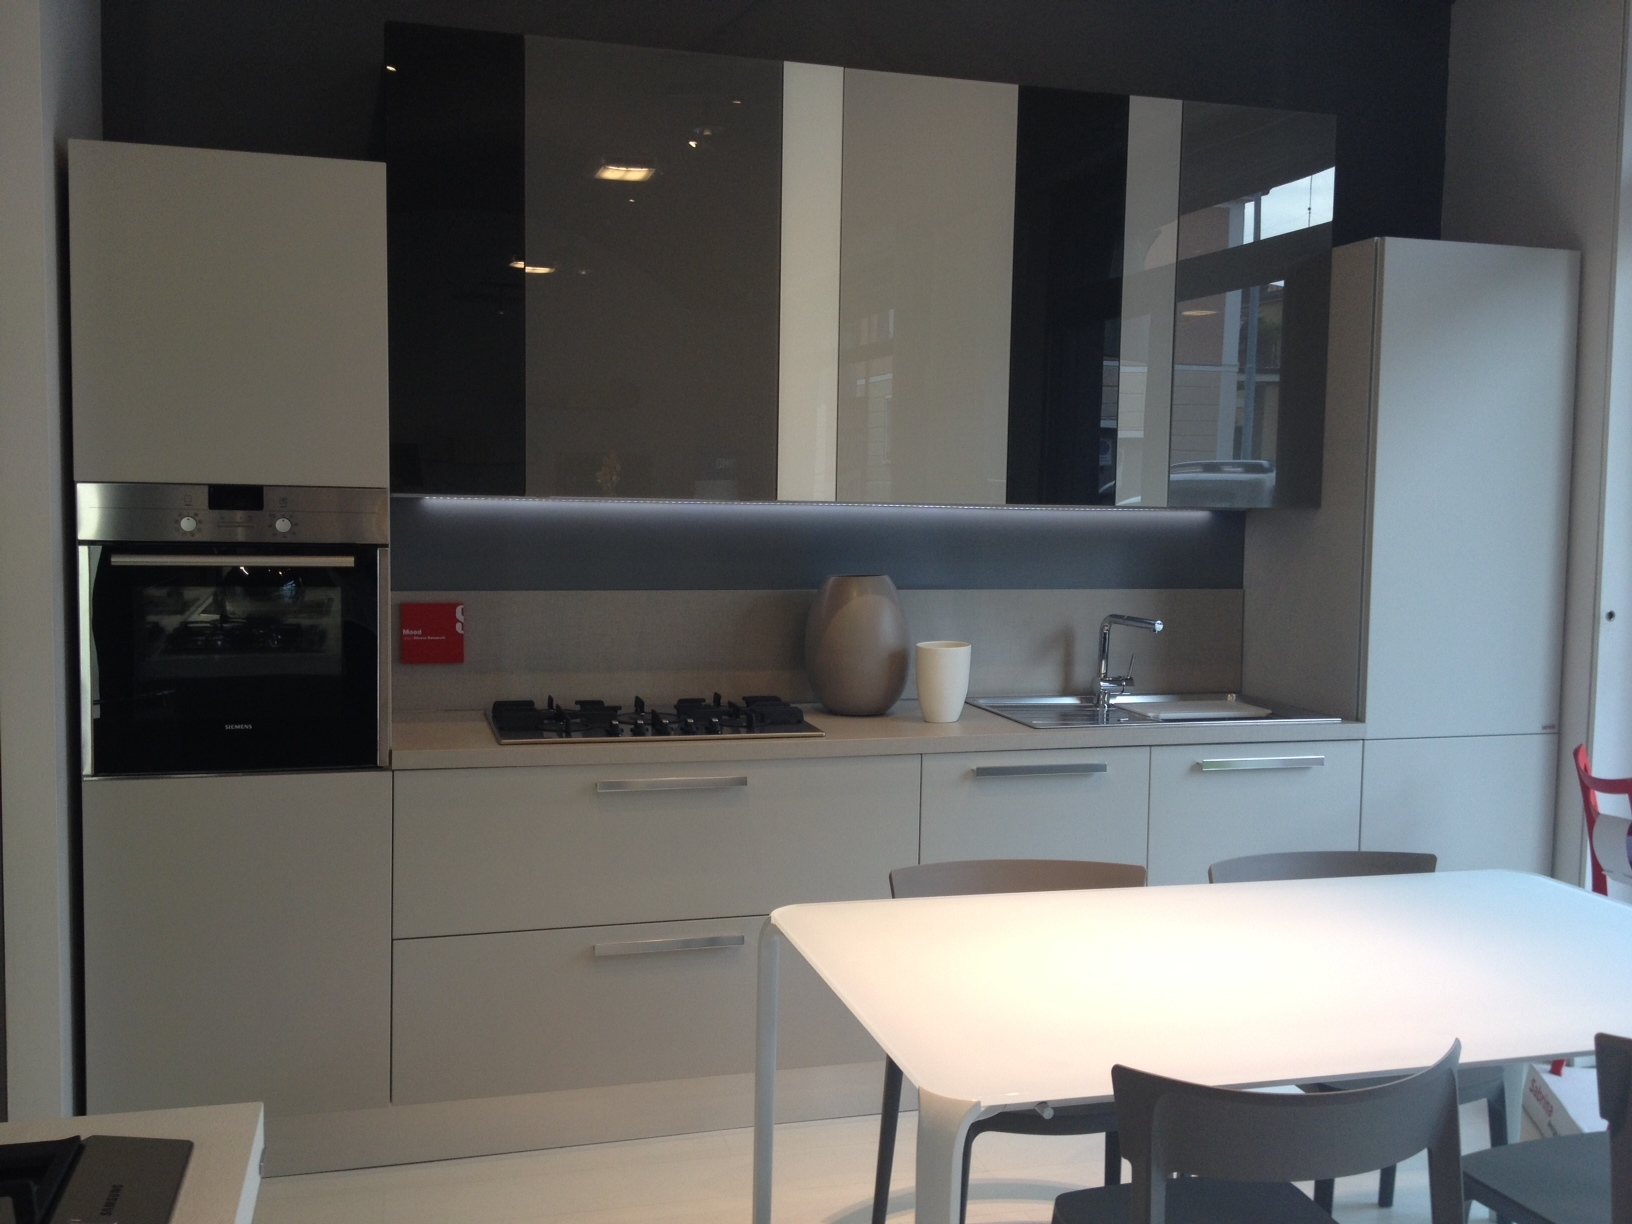 Beautiful Altezza Pensili Cucina Pictures - Idee Arredamento Casa ...